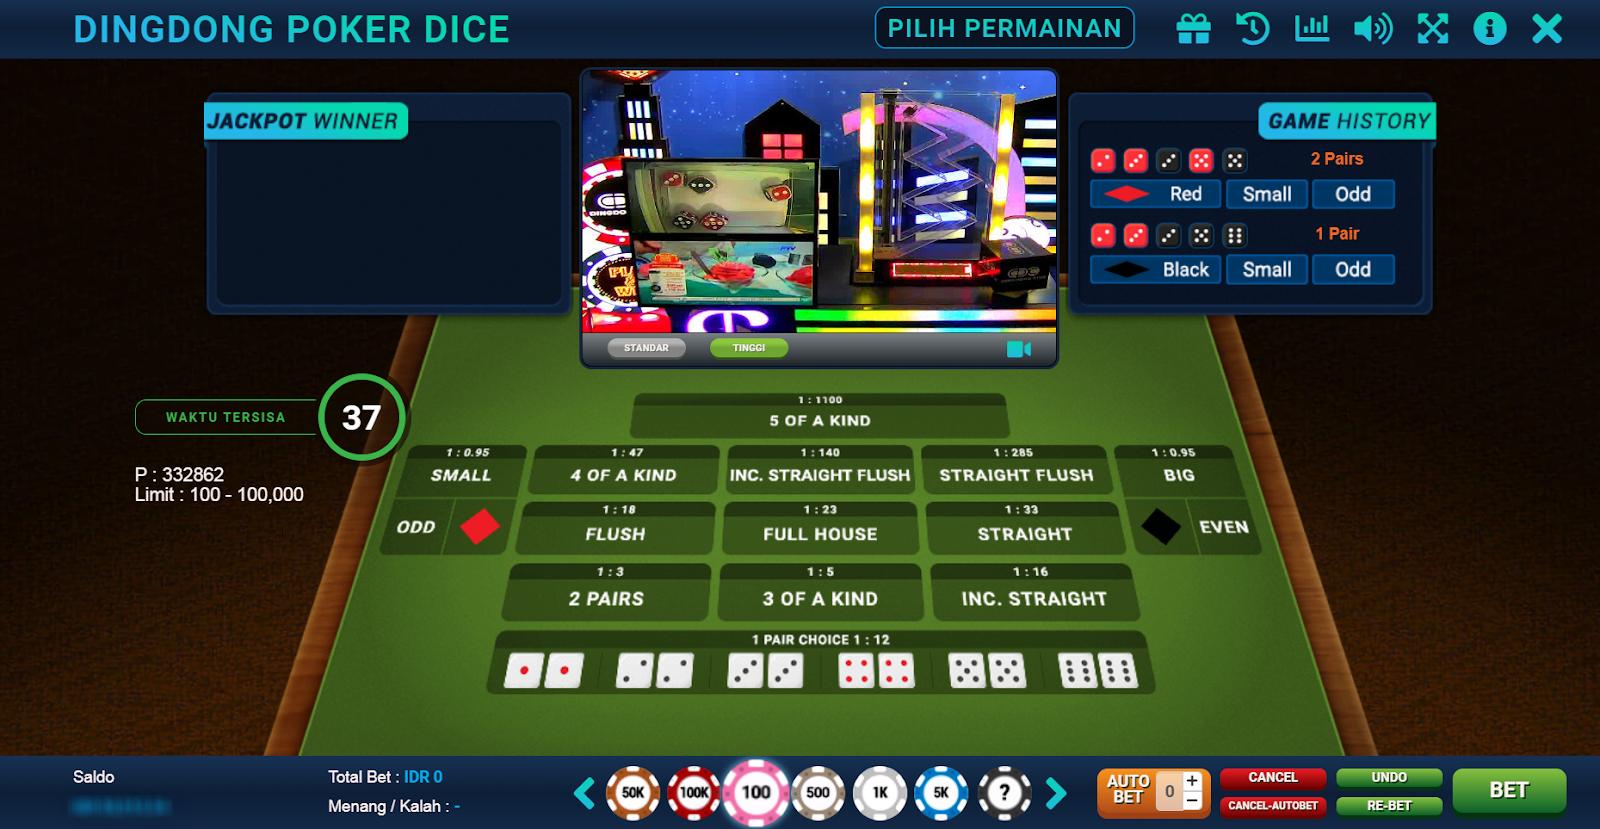 Cara Bermain Dingdong Poker Dice